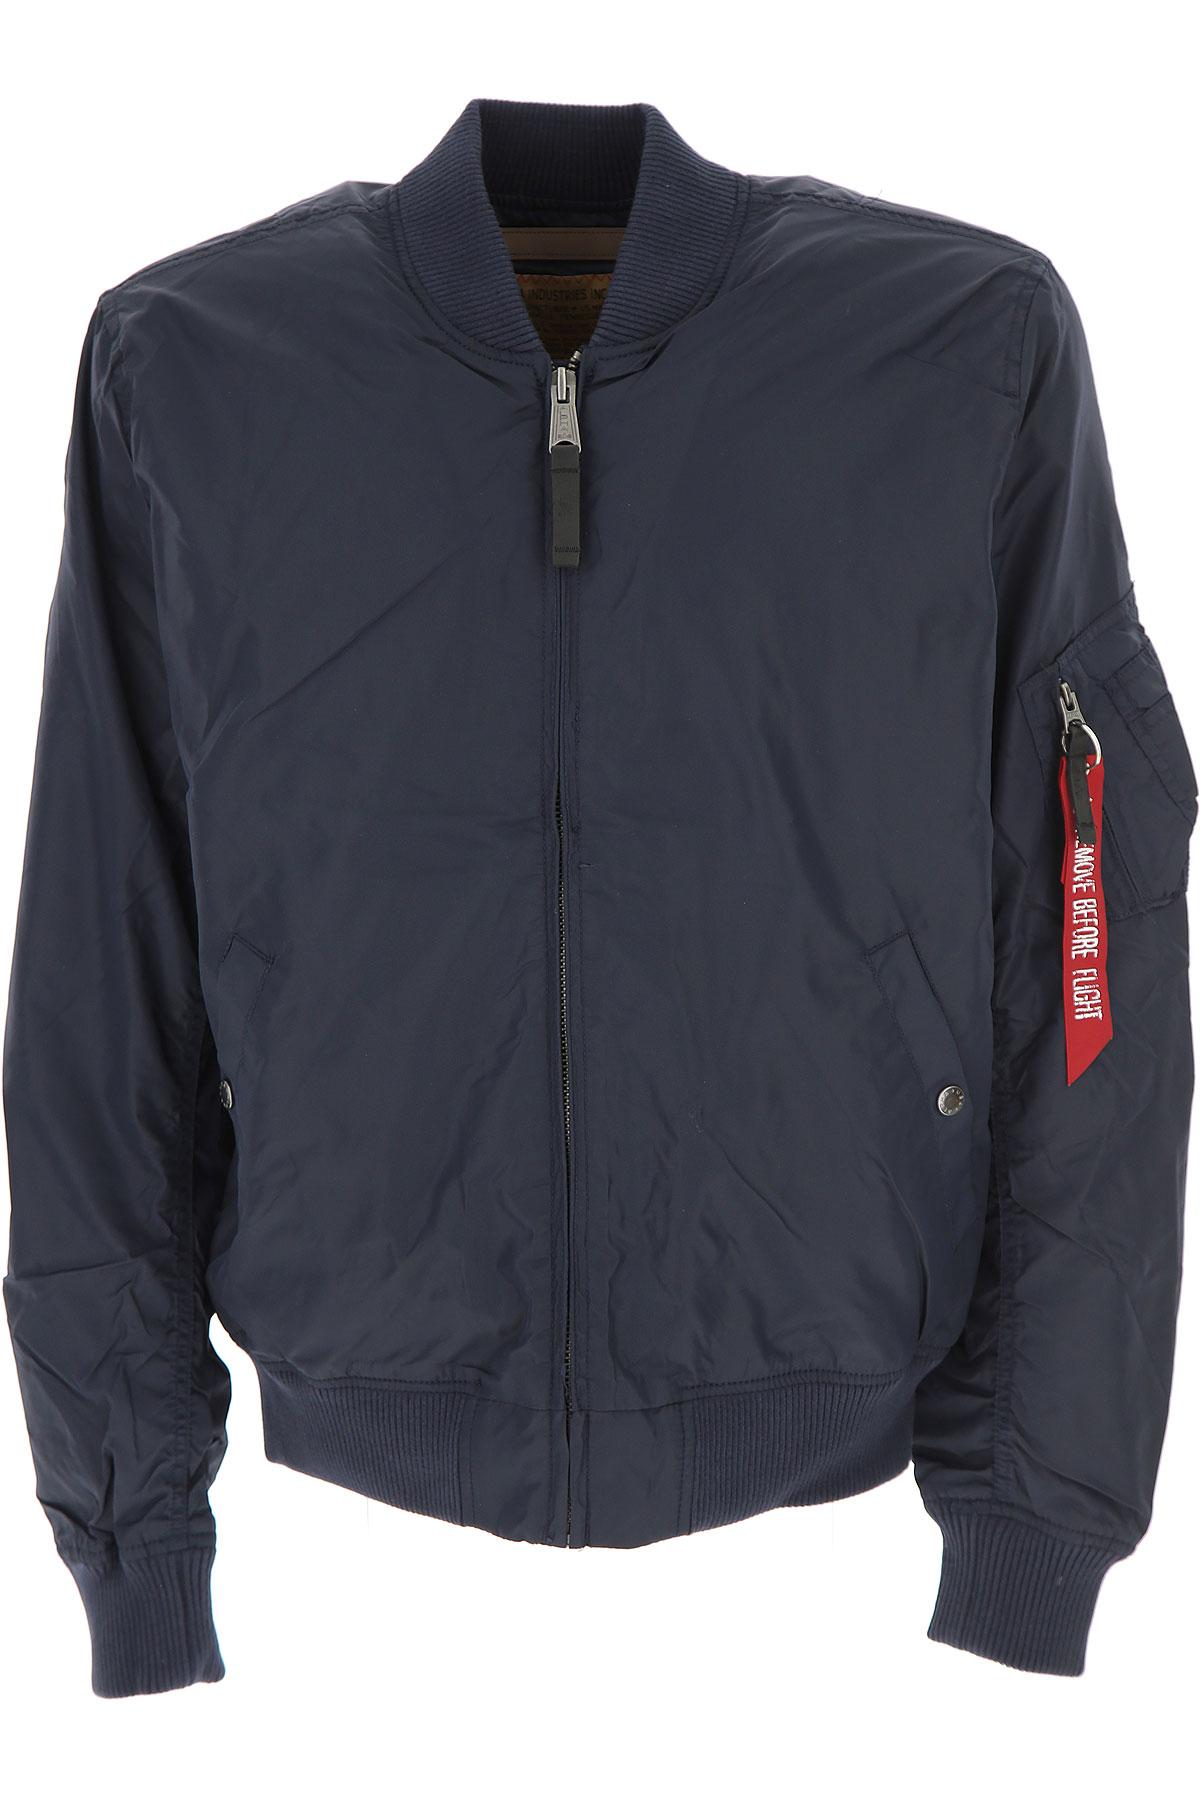 Image of Alpha Industries Jacket for Men On Sale, Navy Blue, Nylon, 2017, L M S XL